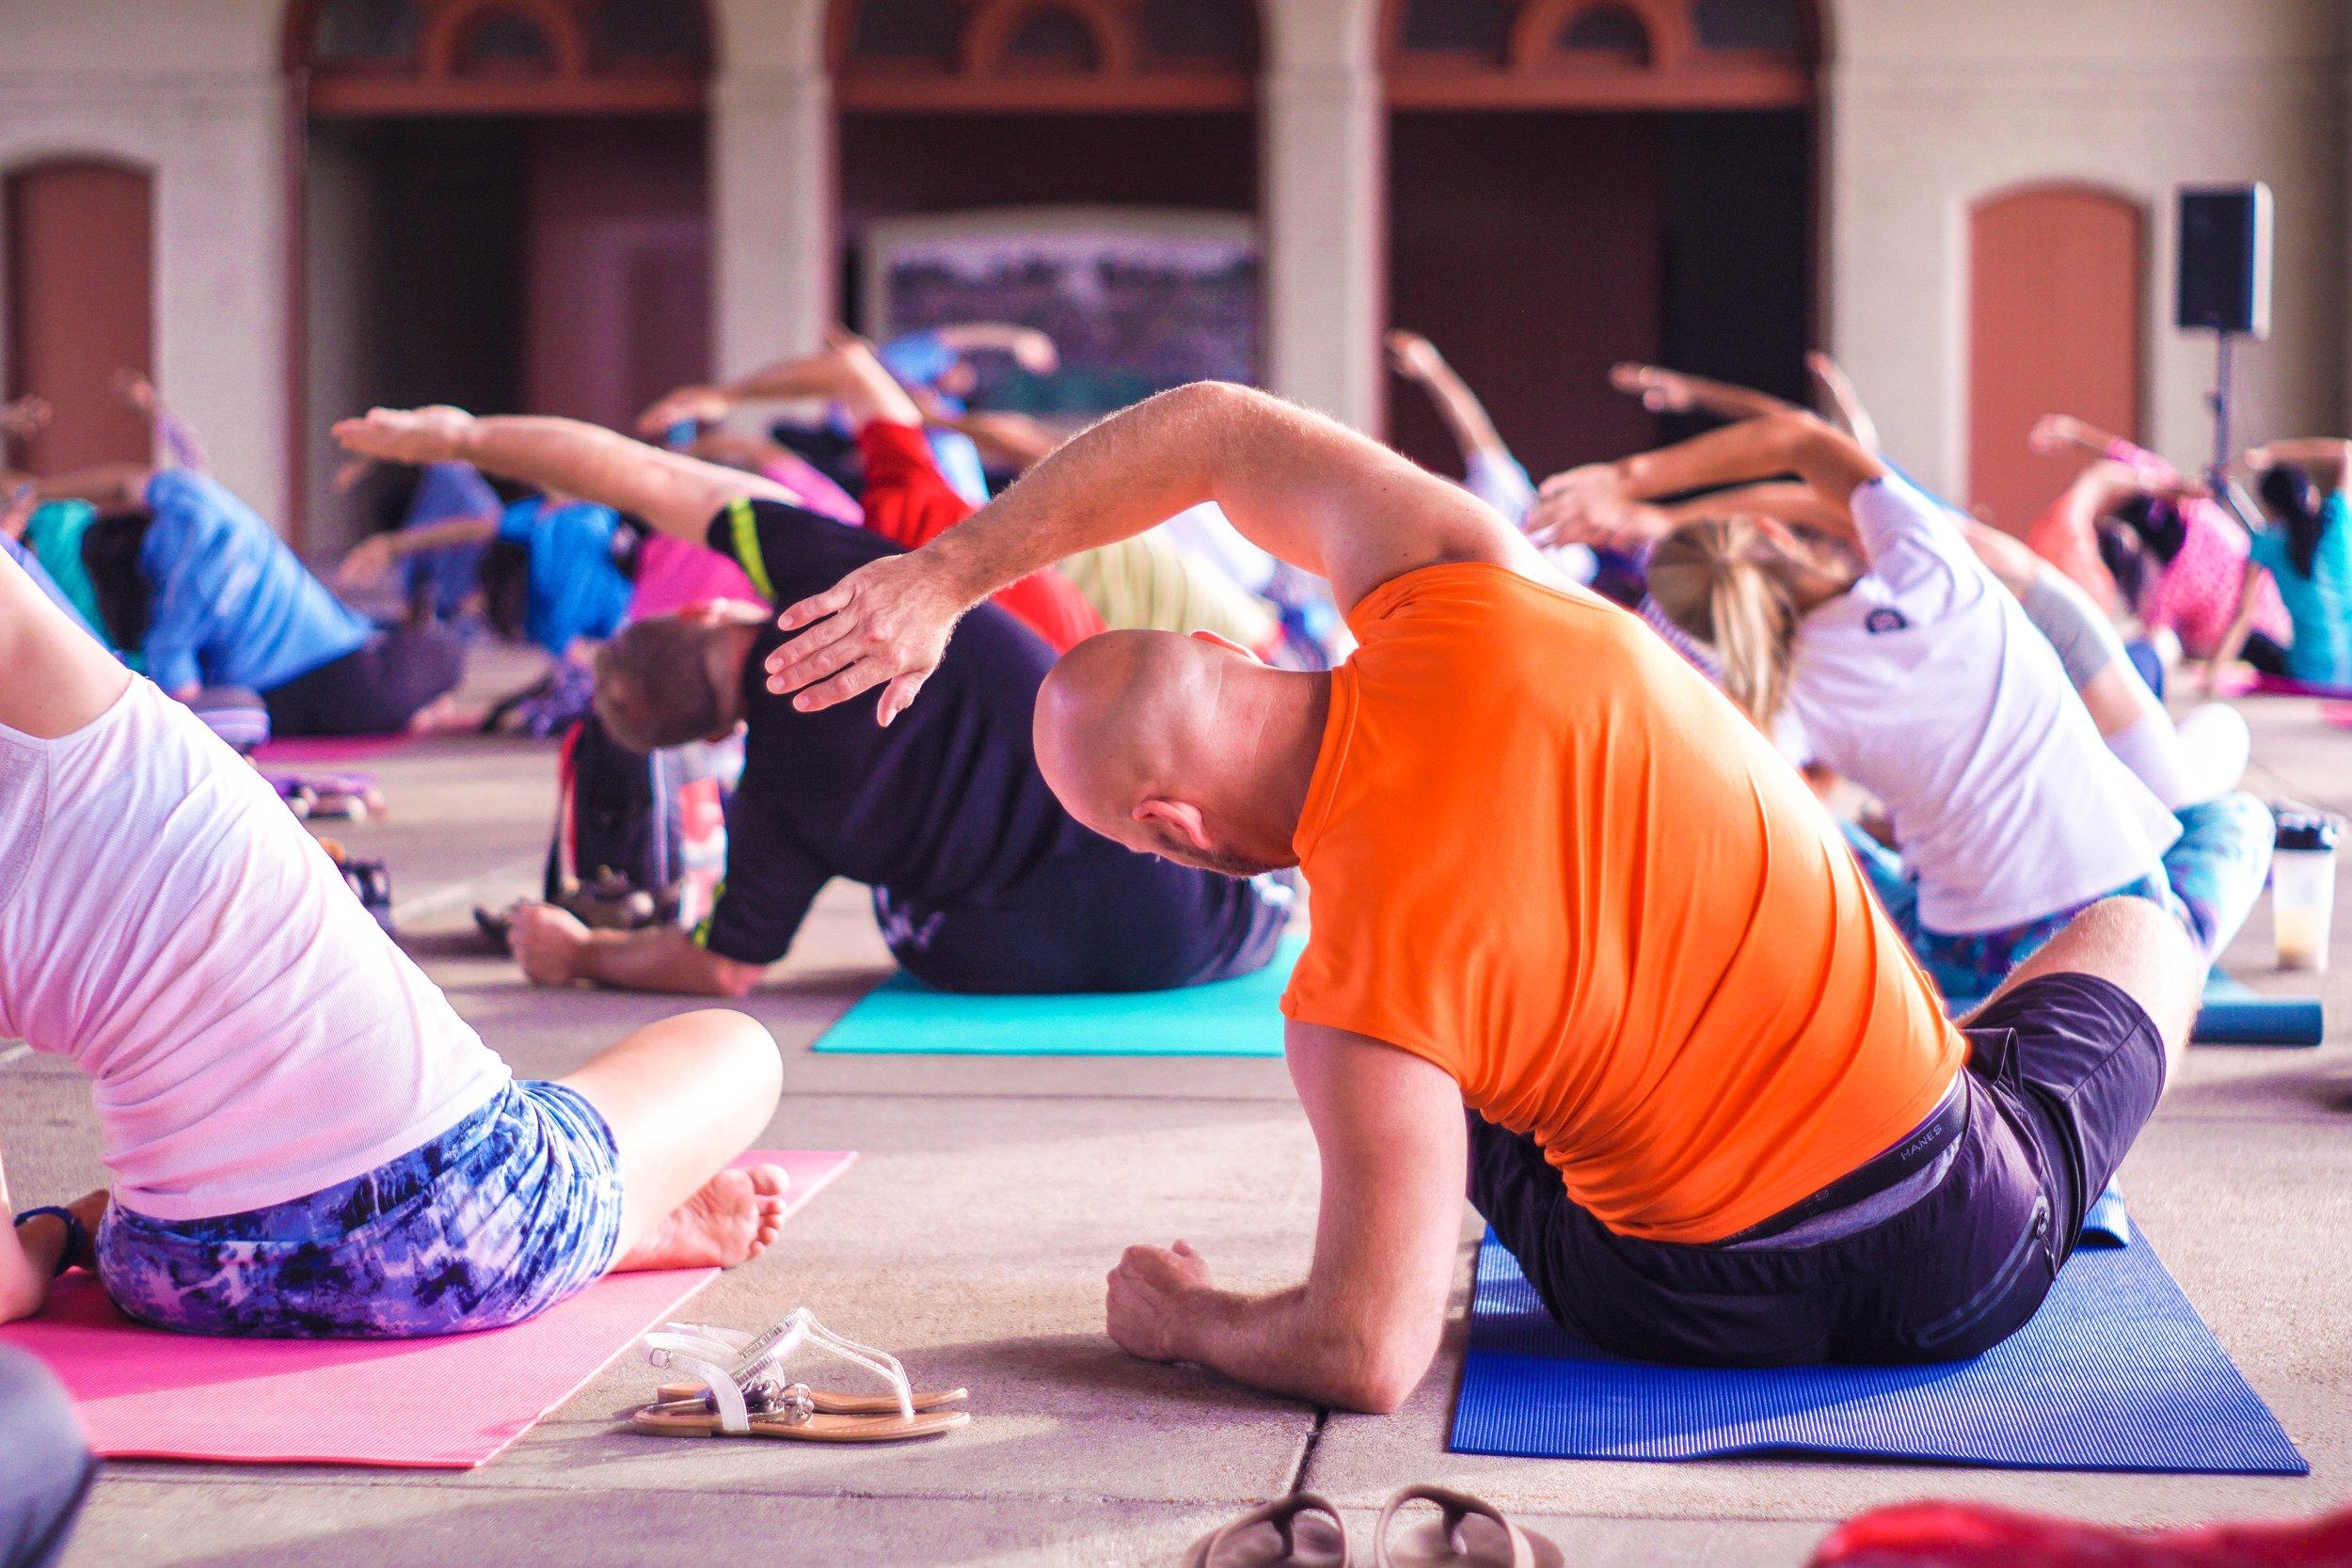 Soul Stretch - Yin Yoga - Tuesdays & Thursdays 6-7pmInstructor: Lori